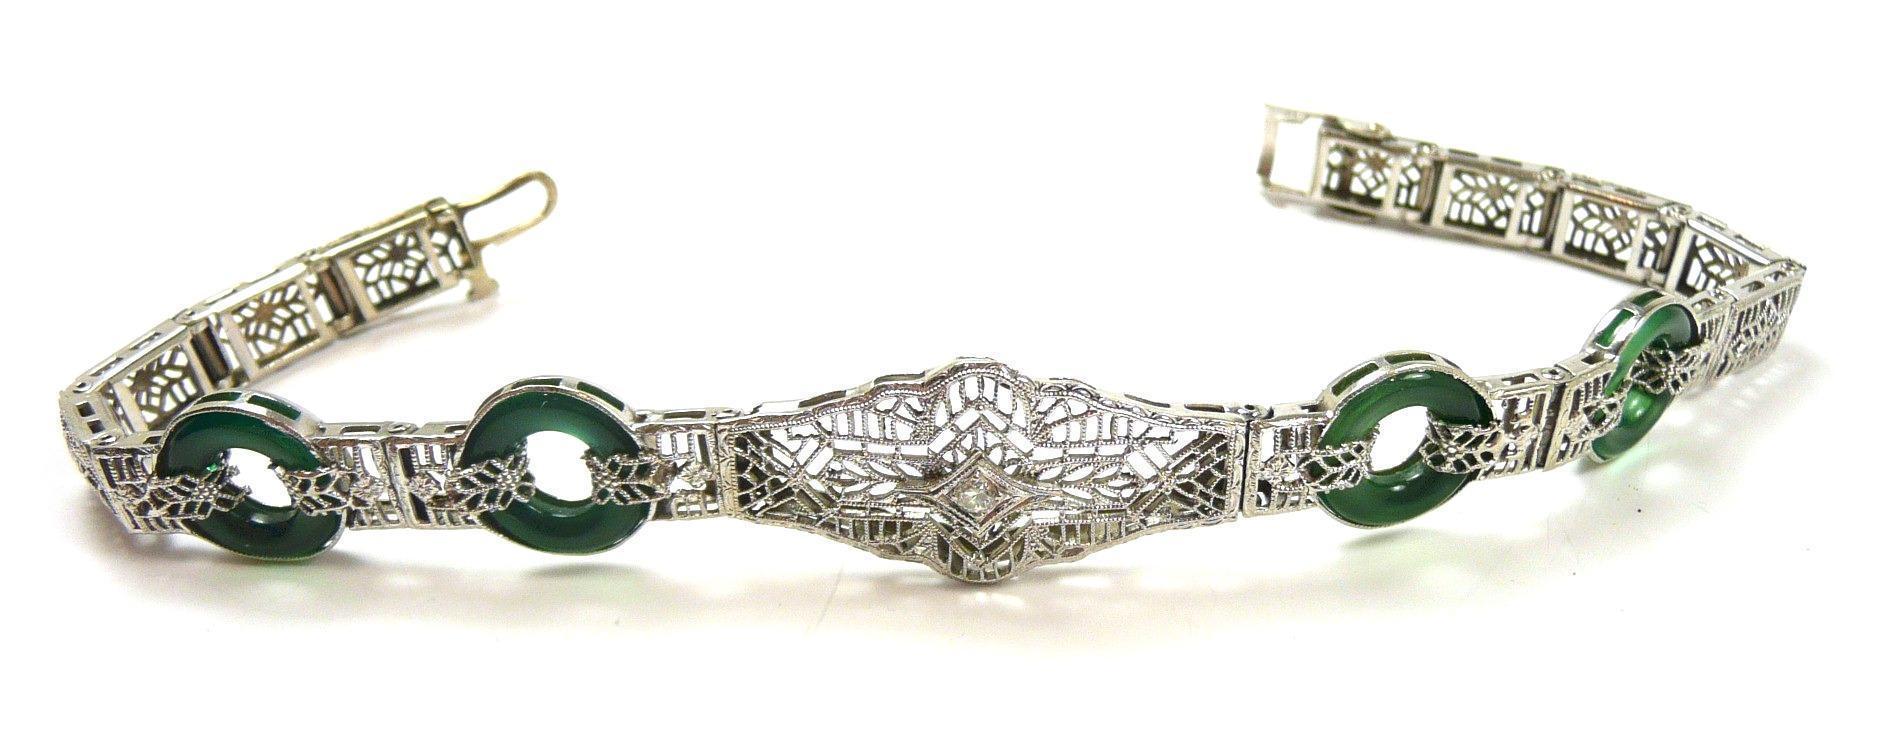 Alluring Art Deco Filigree Diamond and Chrysoprase Bracelet c. 1920